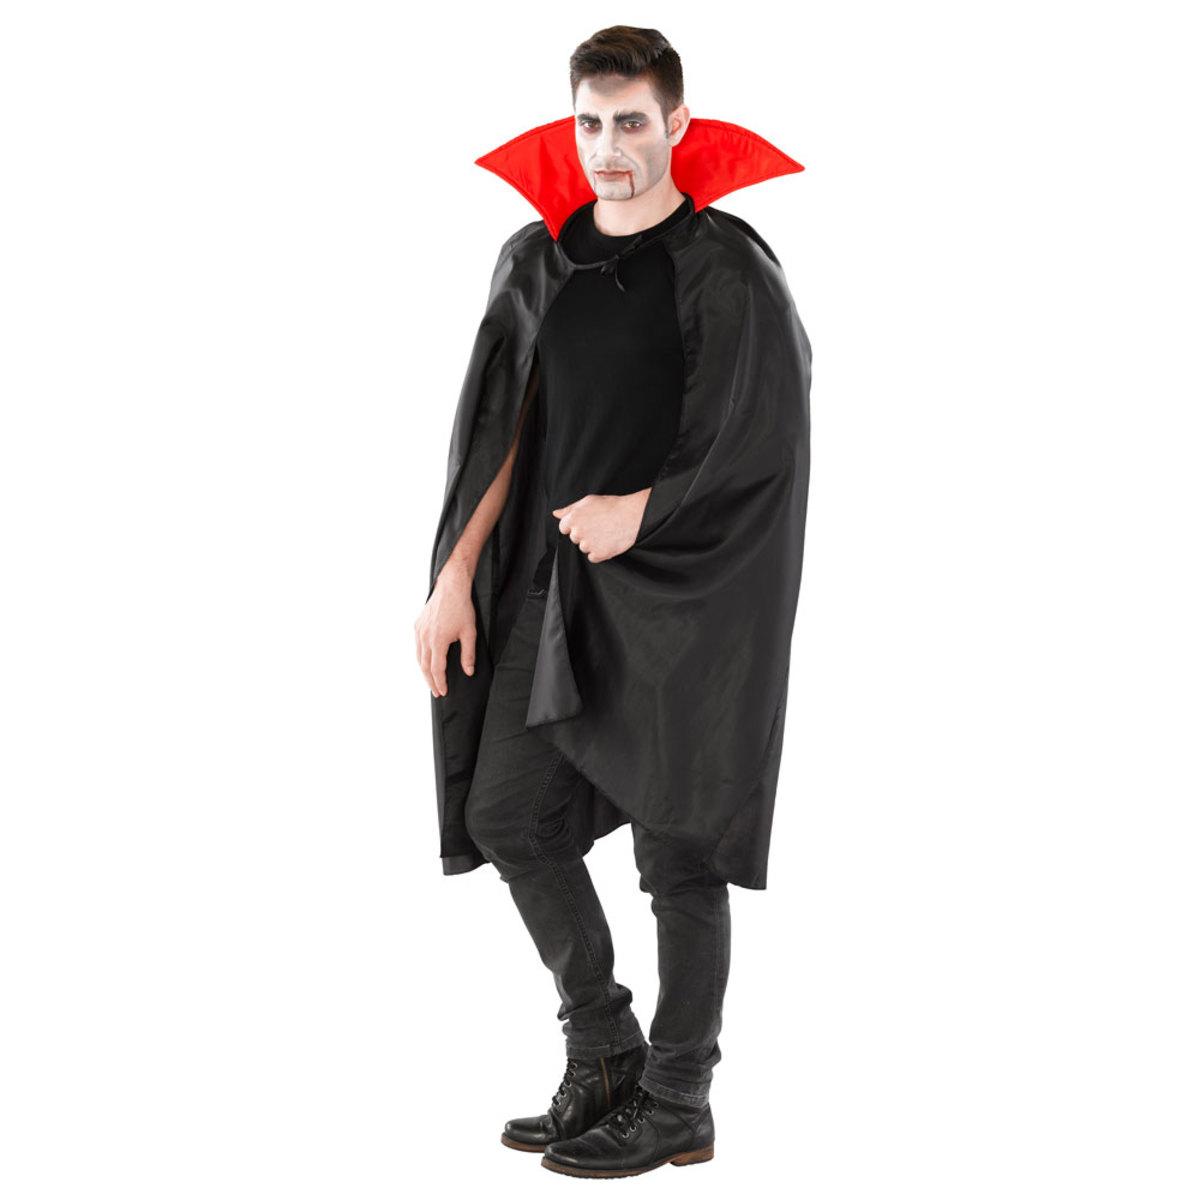 Bild 3 von Dracula Vampir Umhang roter Kragen